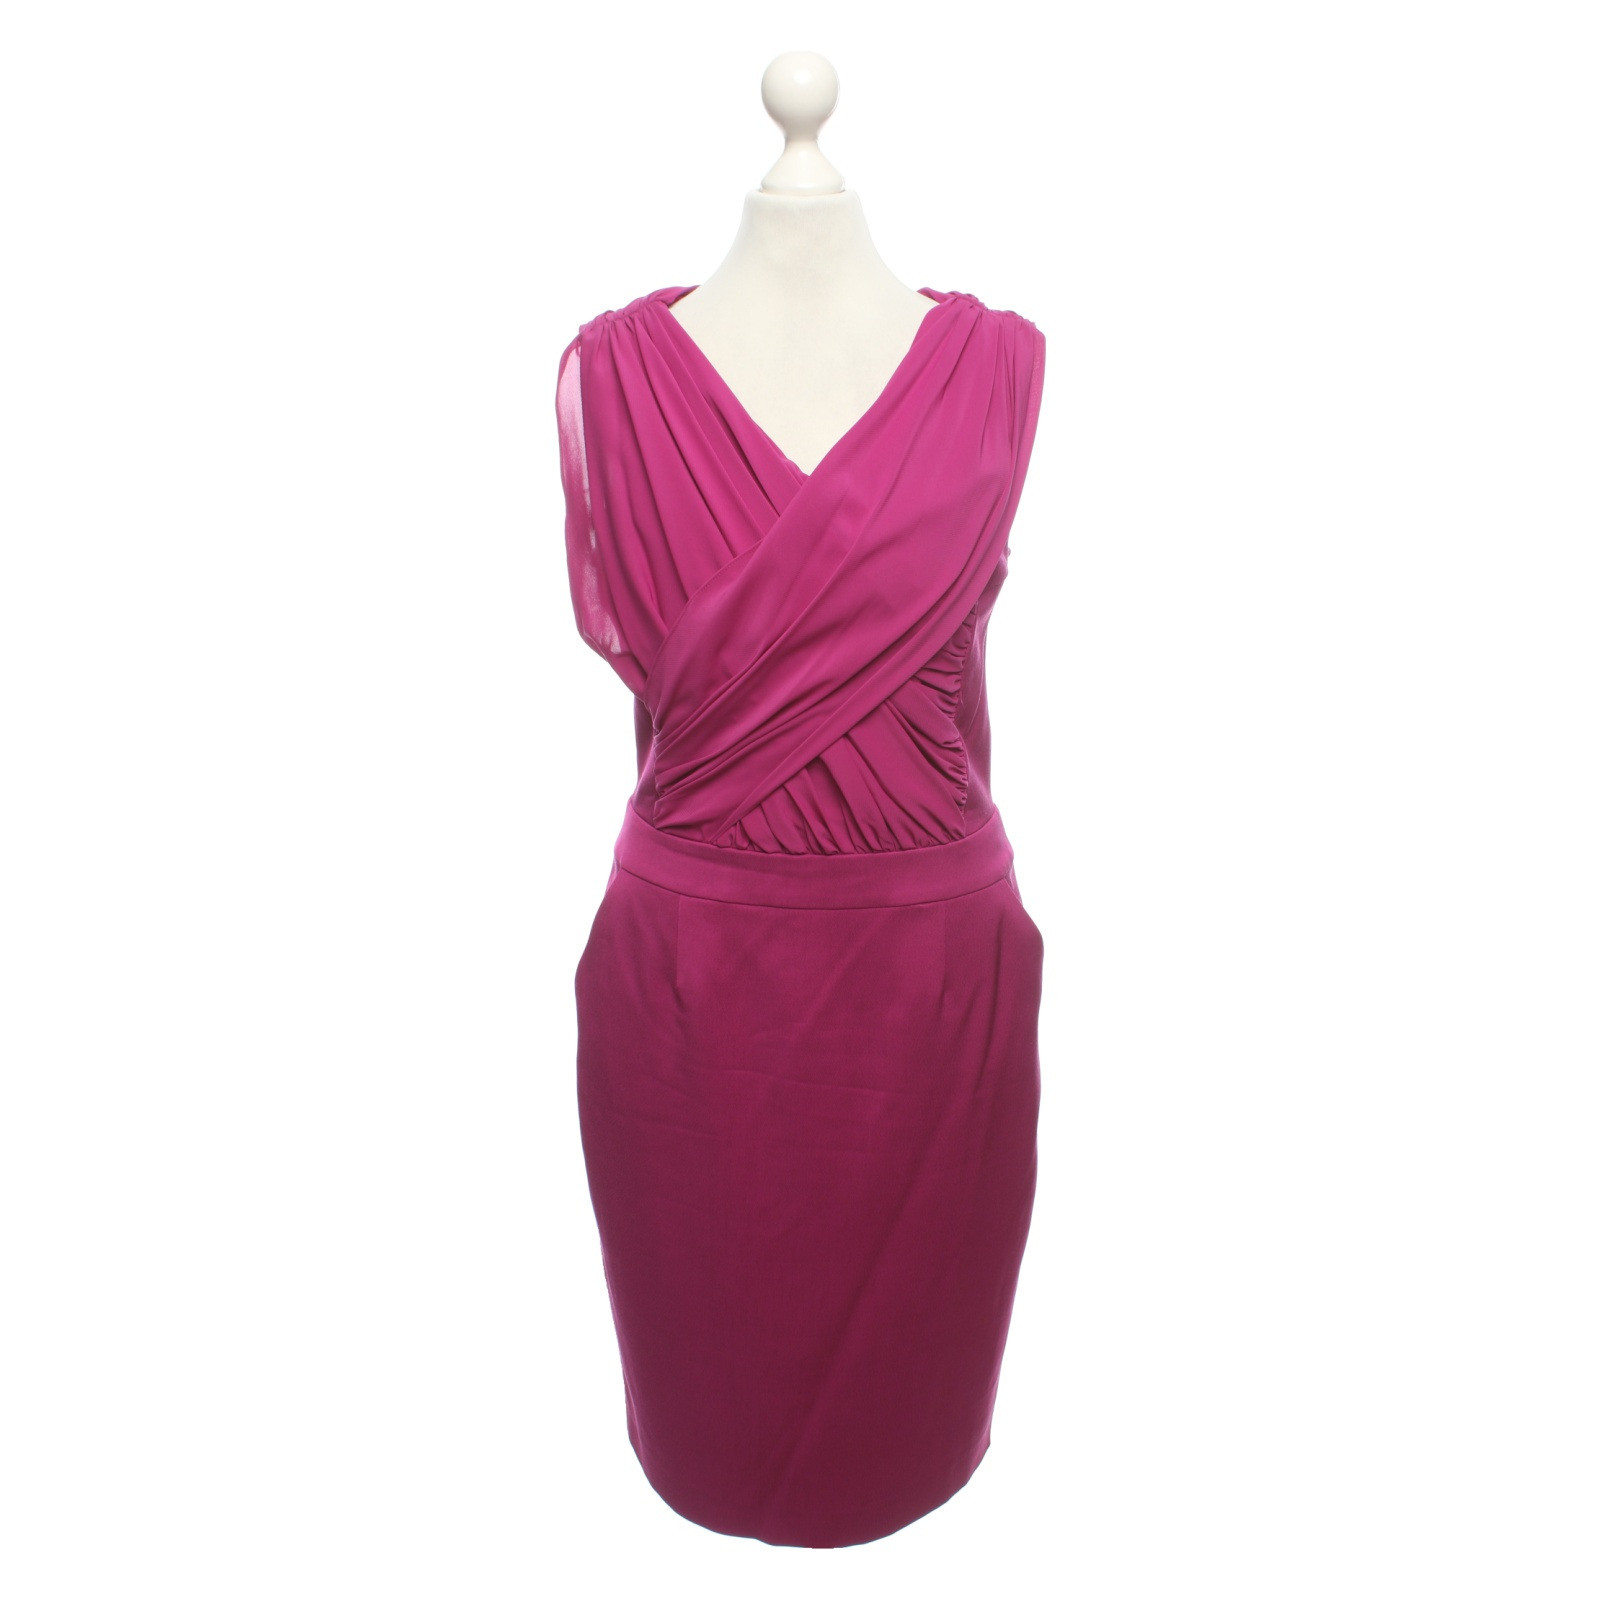 Reiss Kleid in Fuchsia - Second Hand Reiss Kleid in Fuchsia